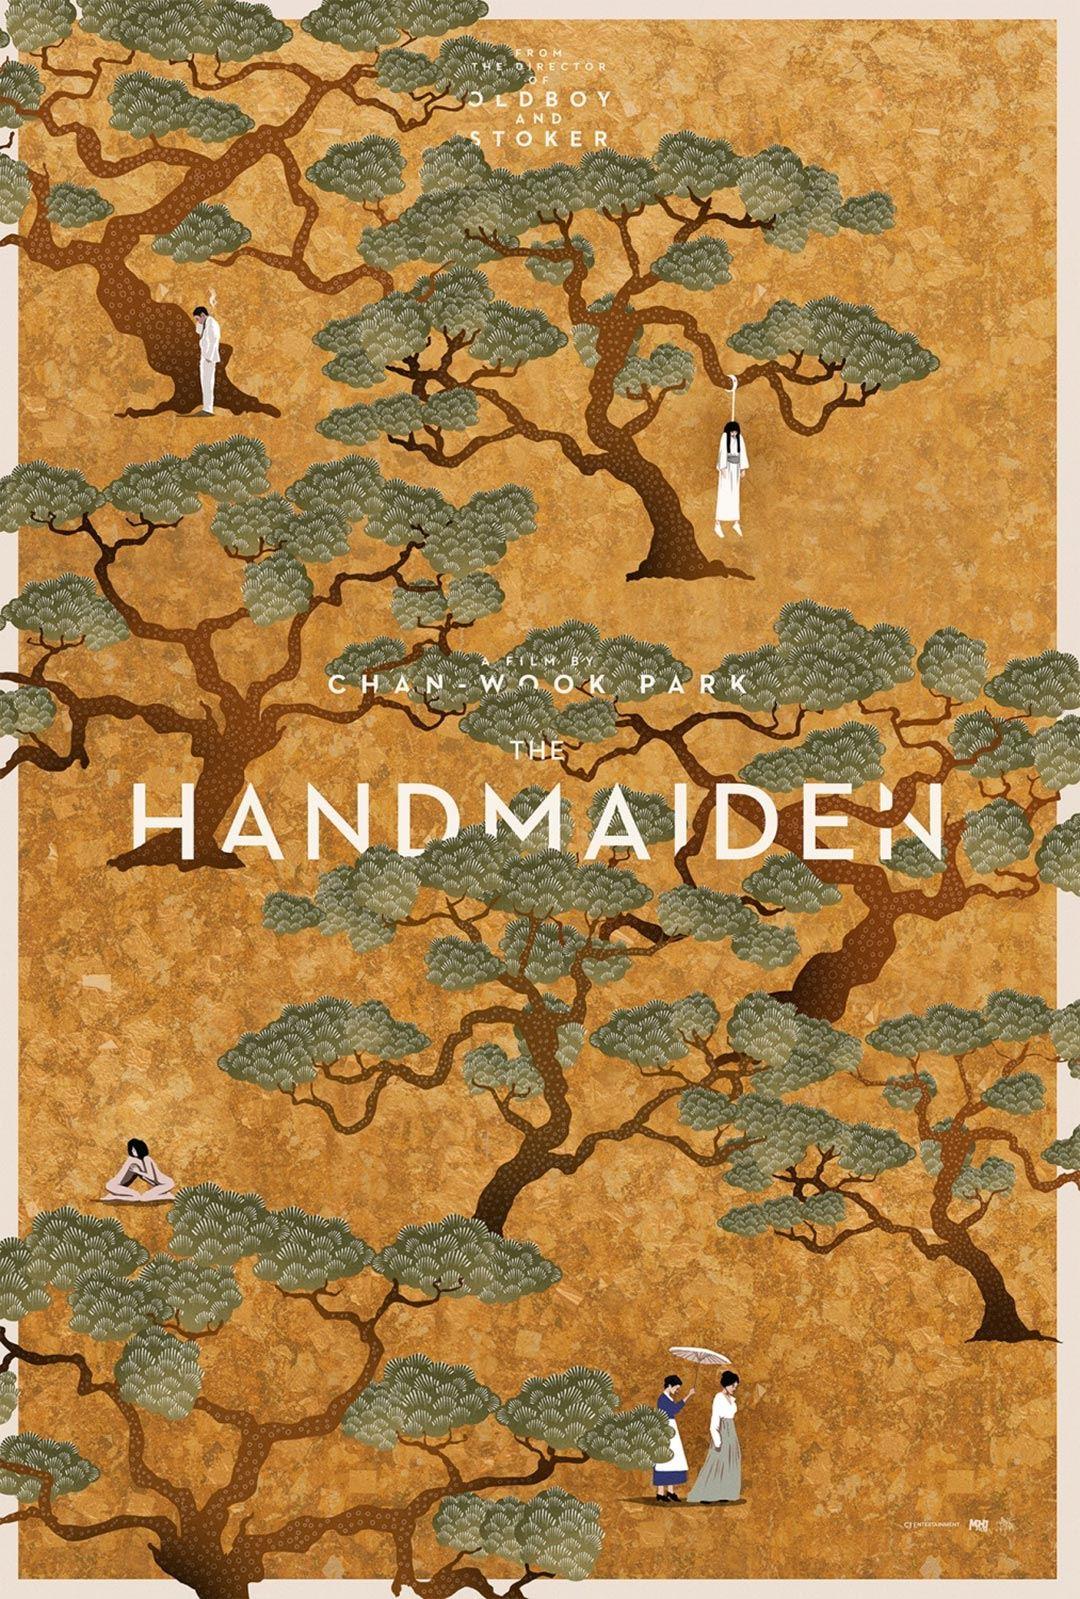 Bio: The Handmaiden